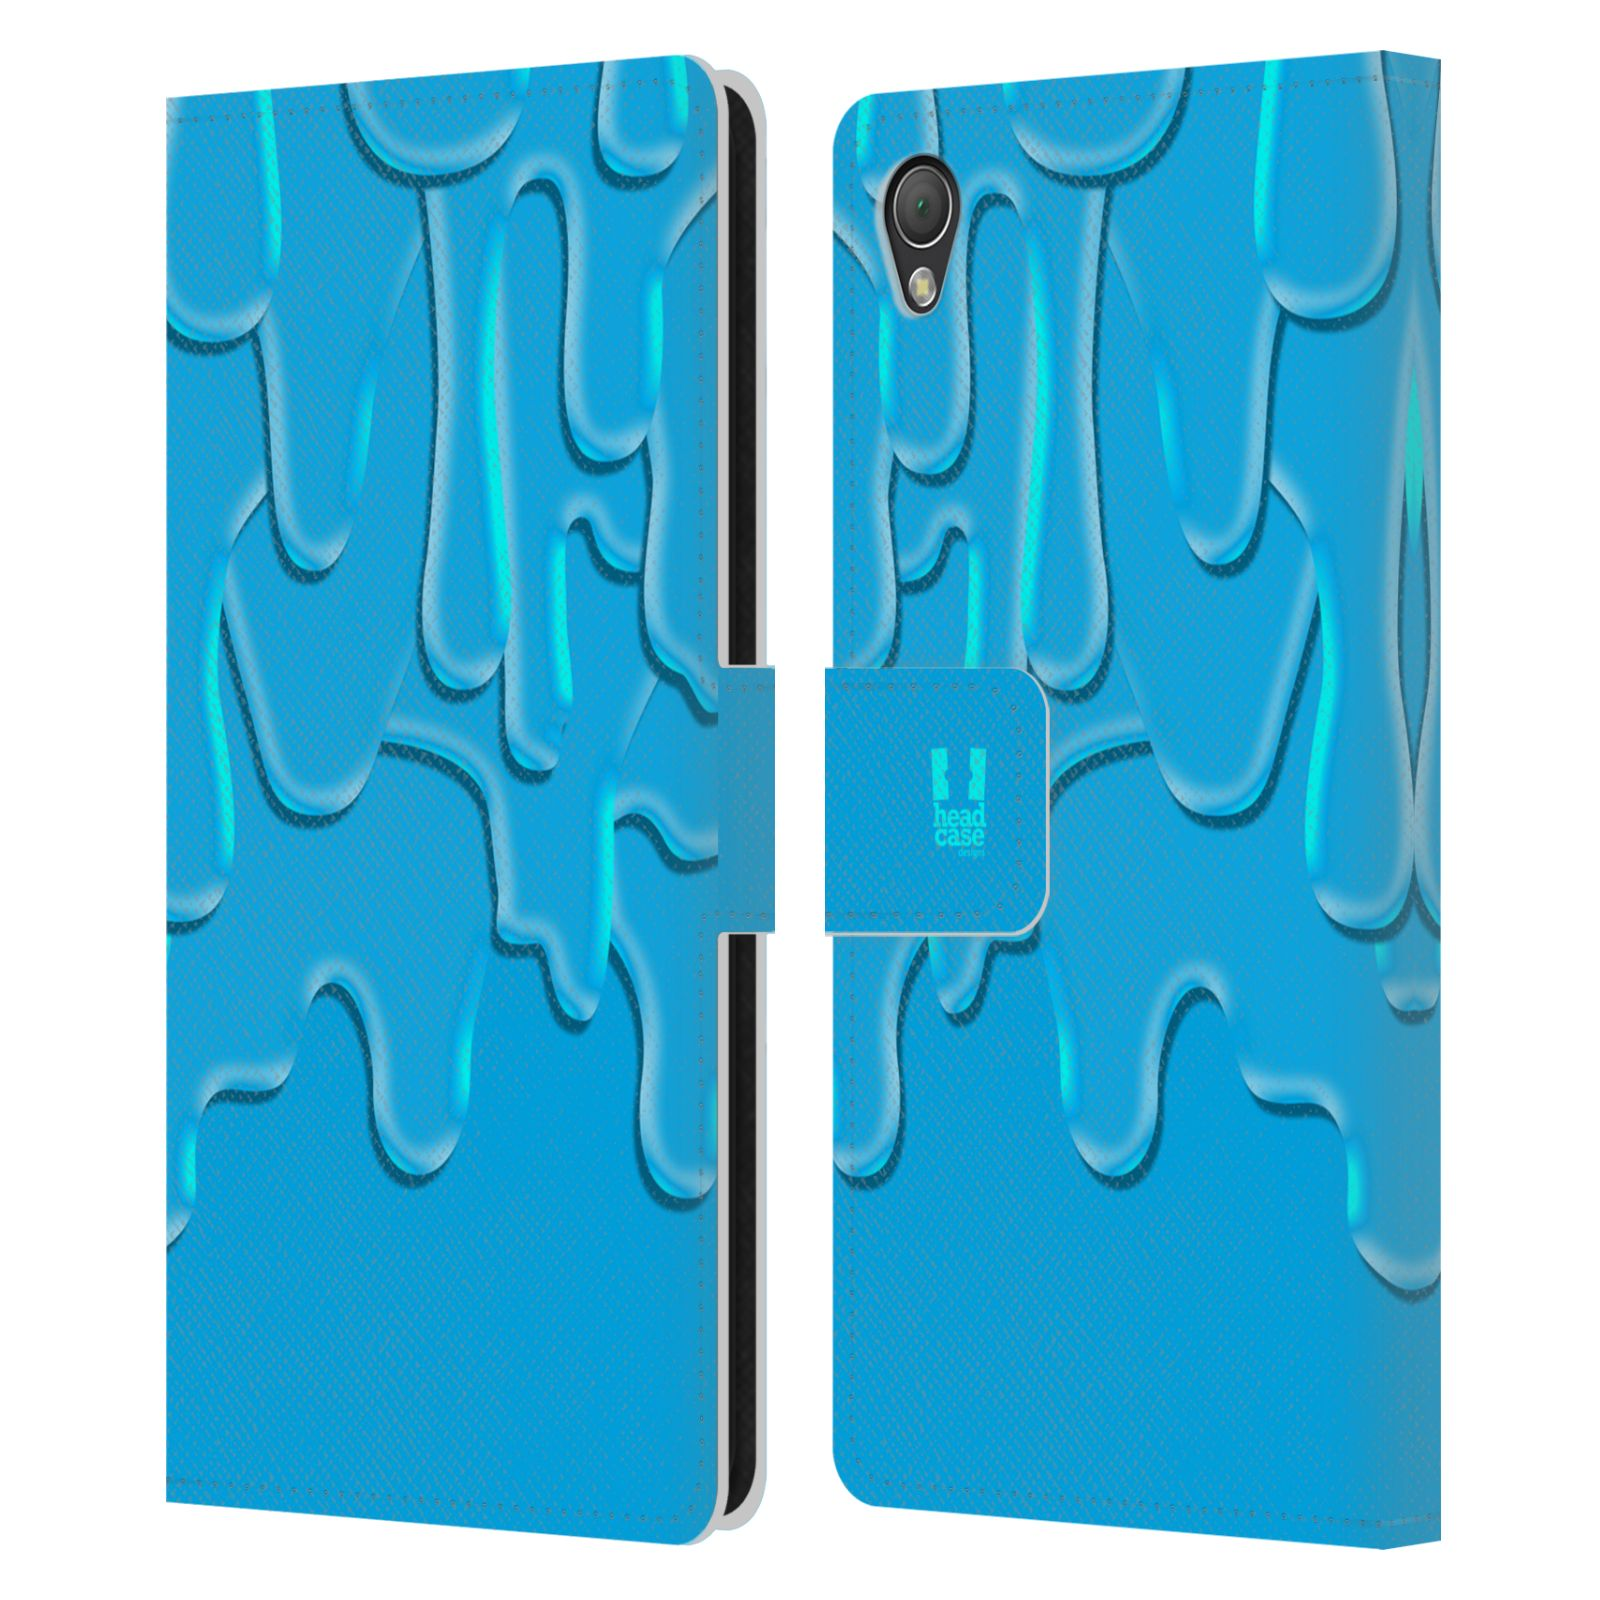 HEAD CASE Flipové pouzdro pro mobil SONY XPERIA Z3 ZÁPLAVA BARVA tyrkysová modrá